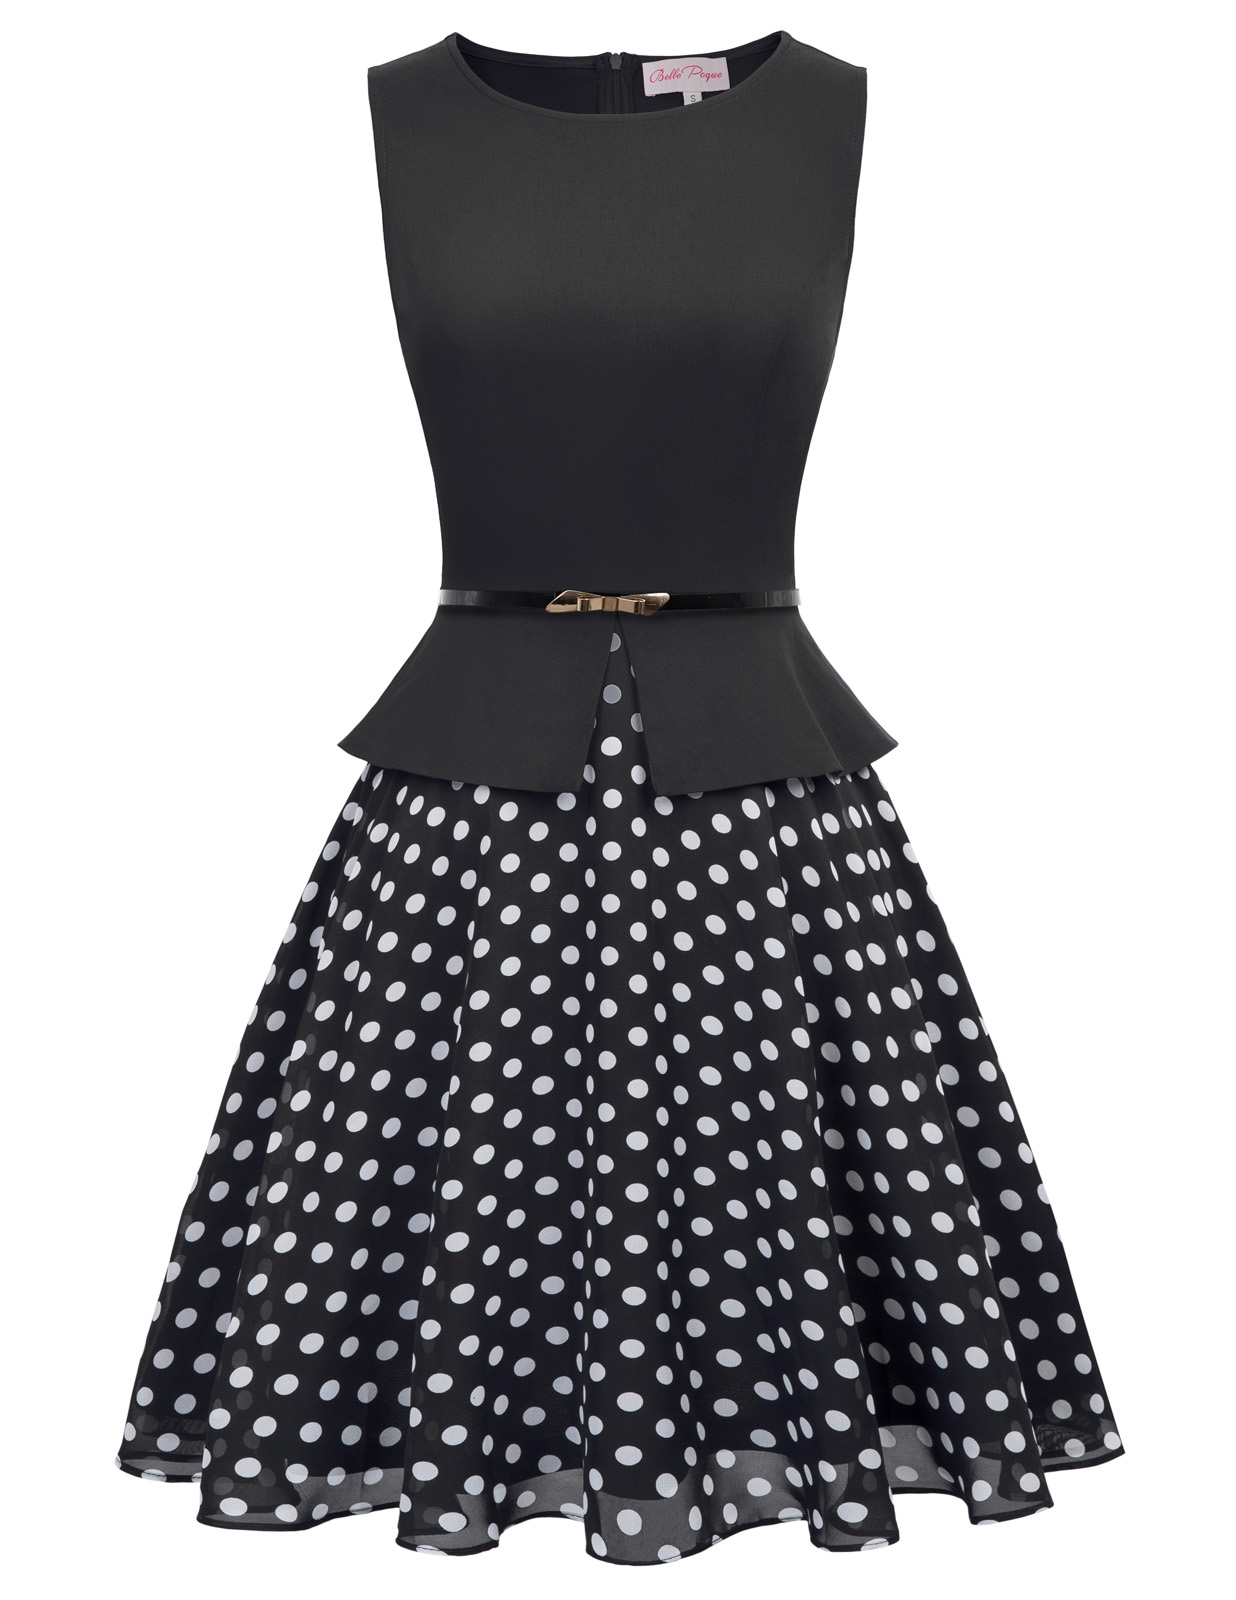 BP Retro Vintage Women Sleeveless Scoop Neck Polka Dots Patchwork A-Line Dress office ladies wear